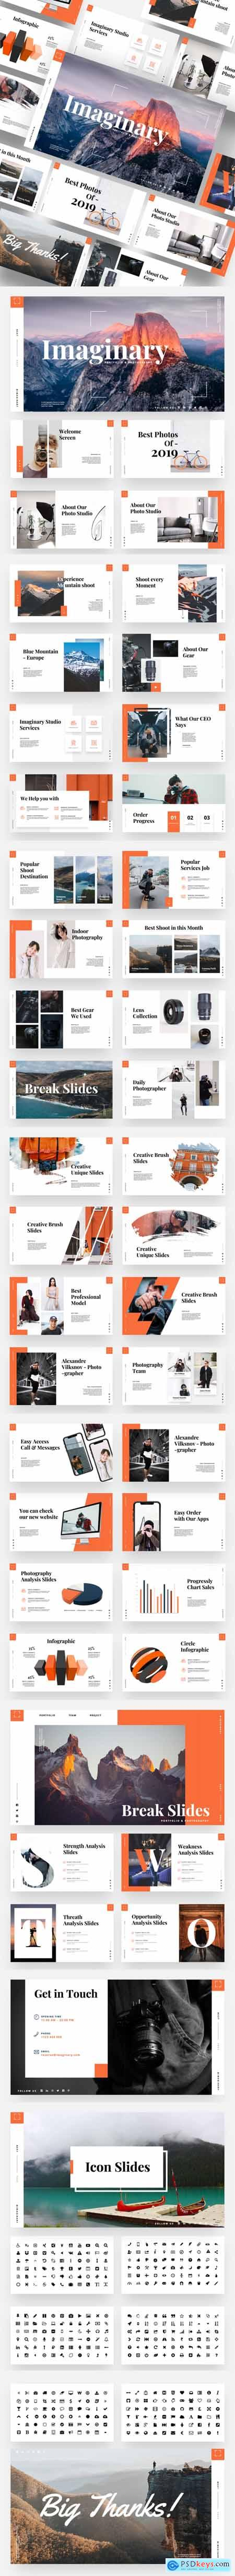 Imaginary - Portfolio & Photography Powerpoint Template 23619490